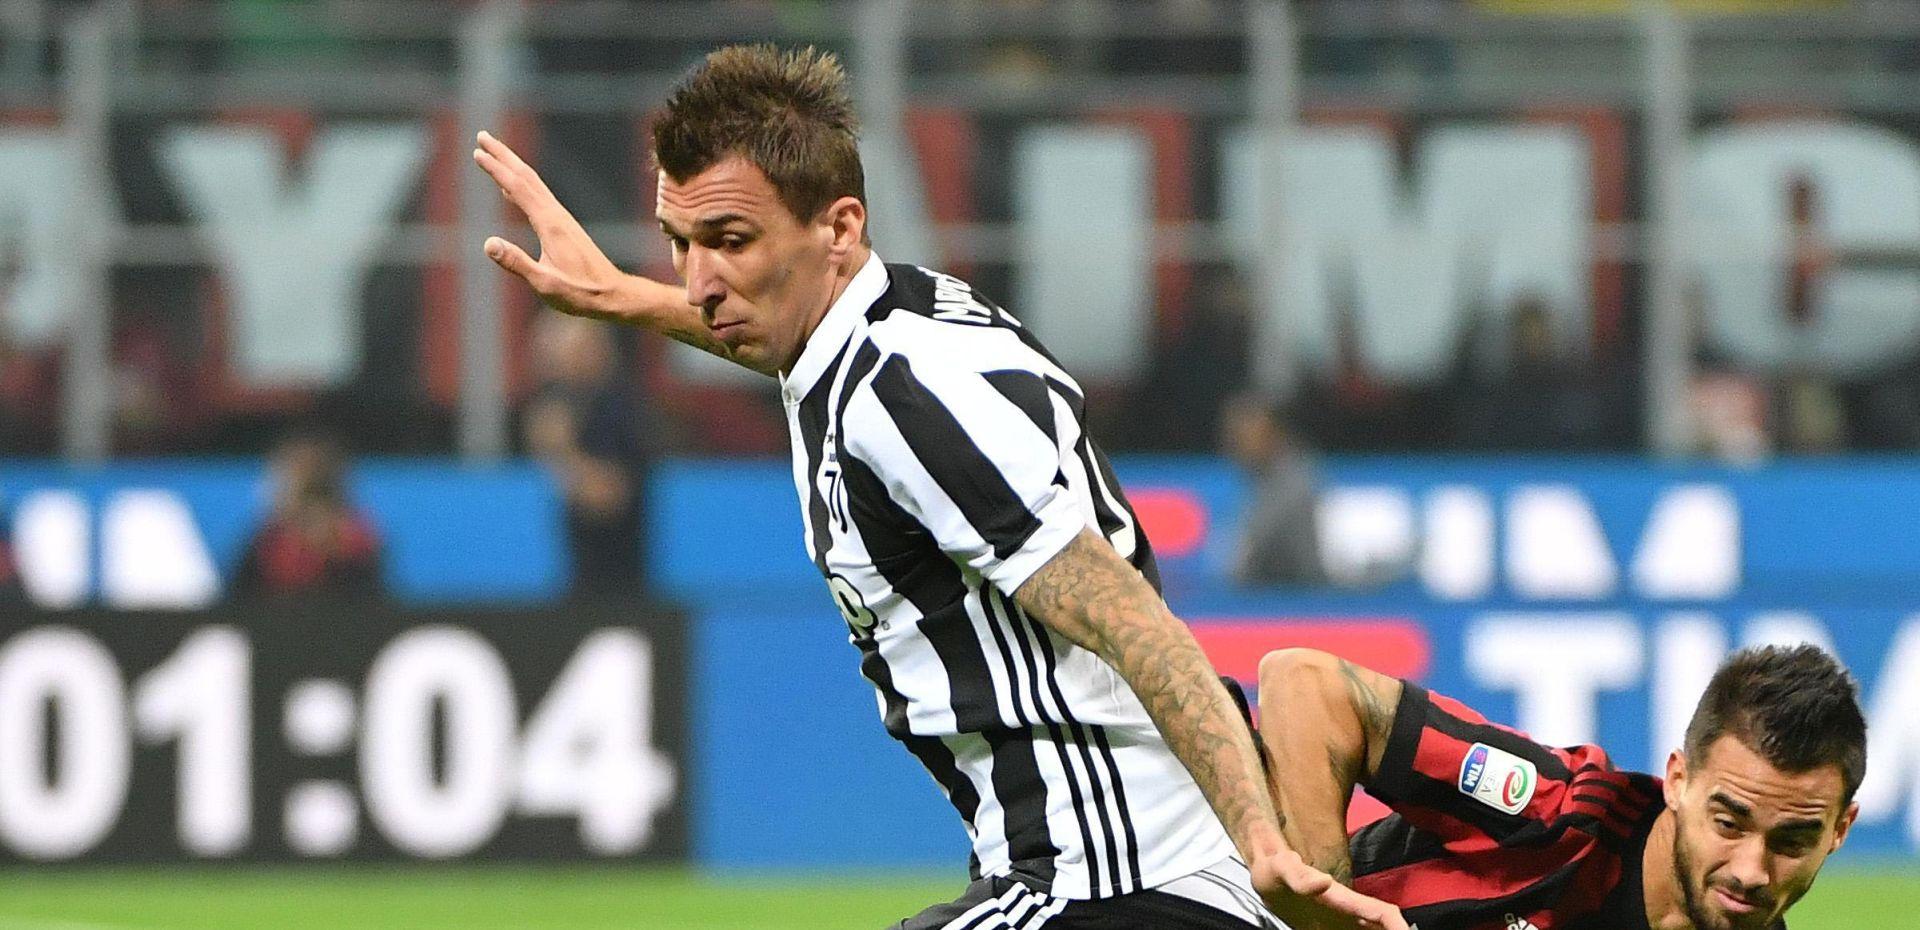 Mandžukić asistirao za pobjedu Juventusa